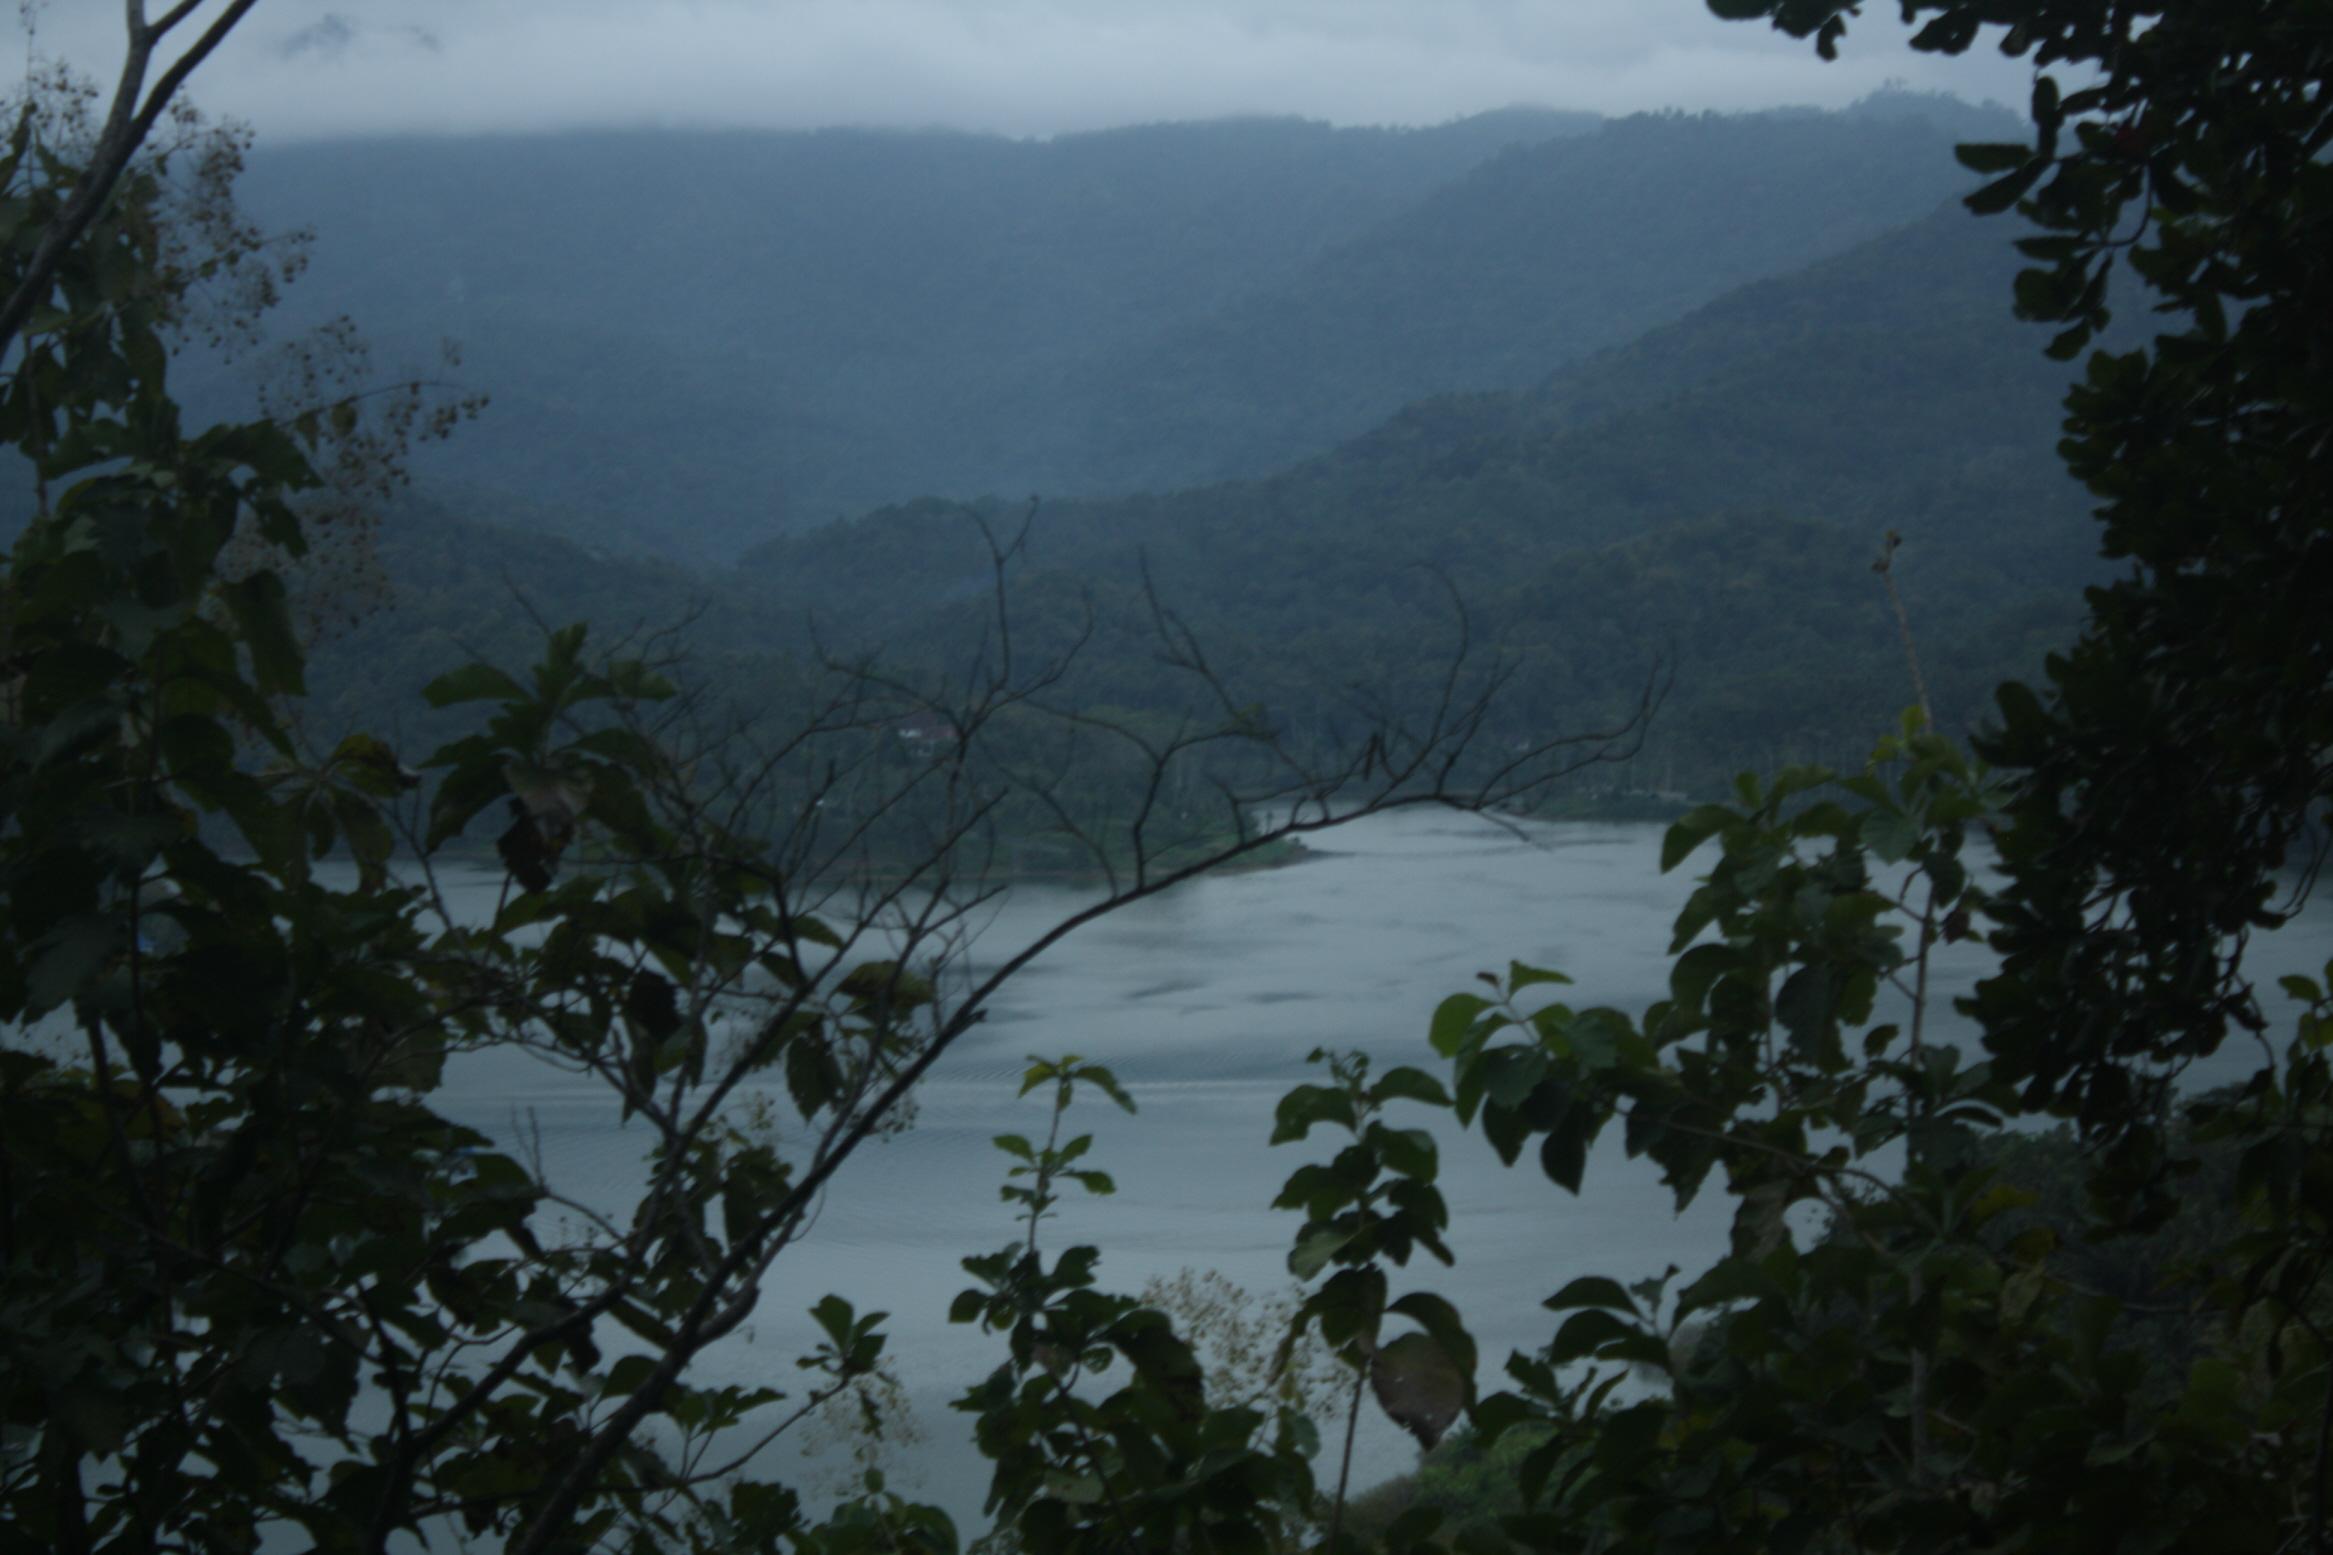 Waduk Sermo di sore hari (3/6). Dahulu menurut warga sekitar terdapat Dusun Sermo Tengah di dasar waduk yang saat ini terbenam air. Foto: Wahyu Z/PENDAPA